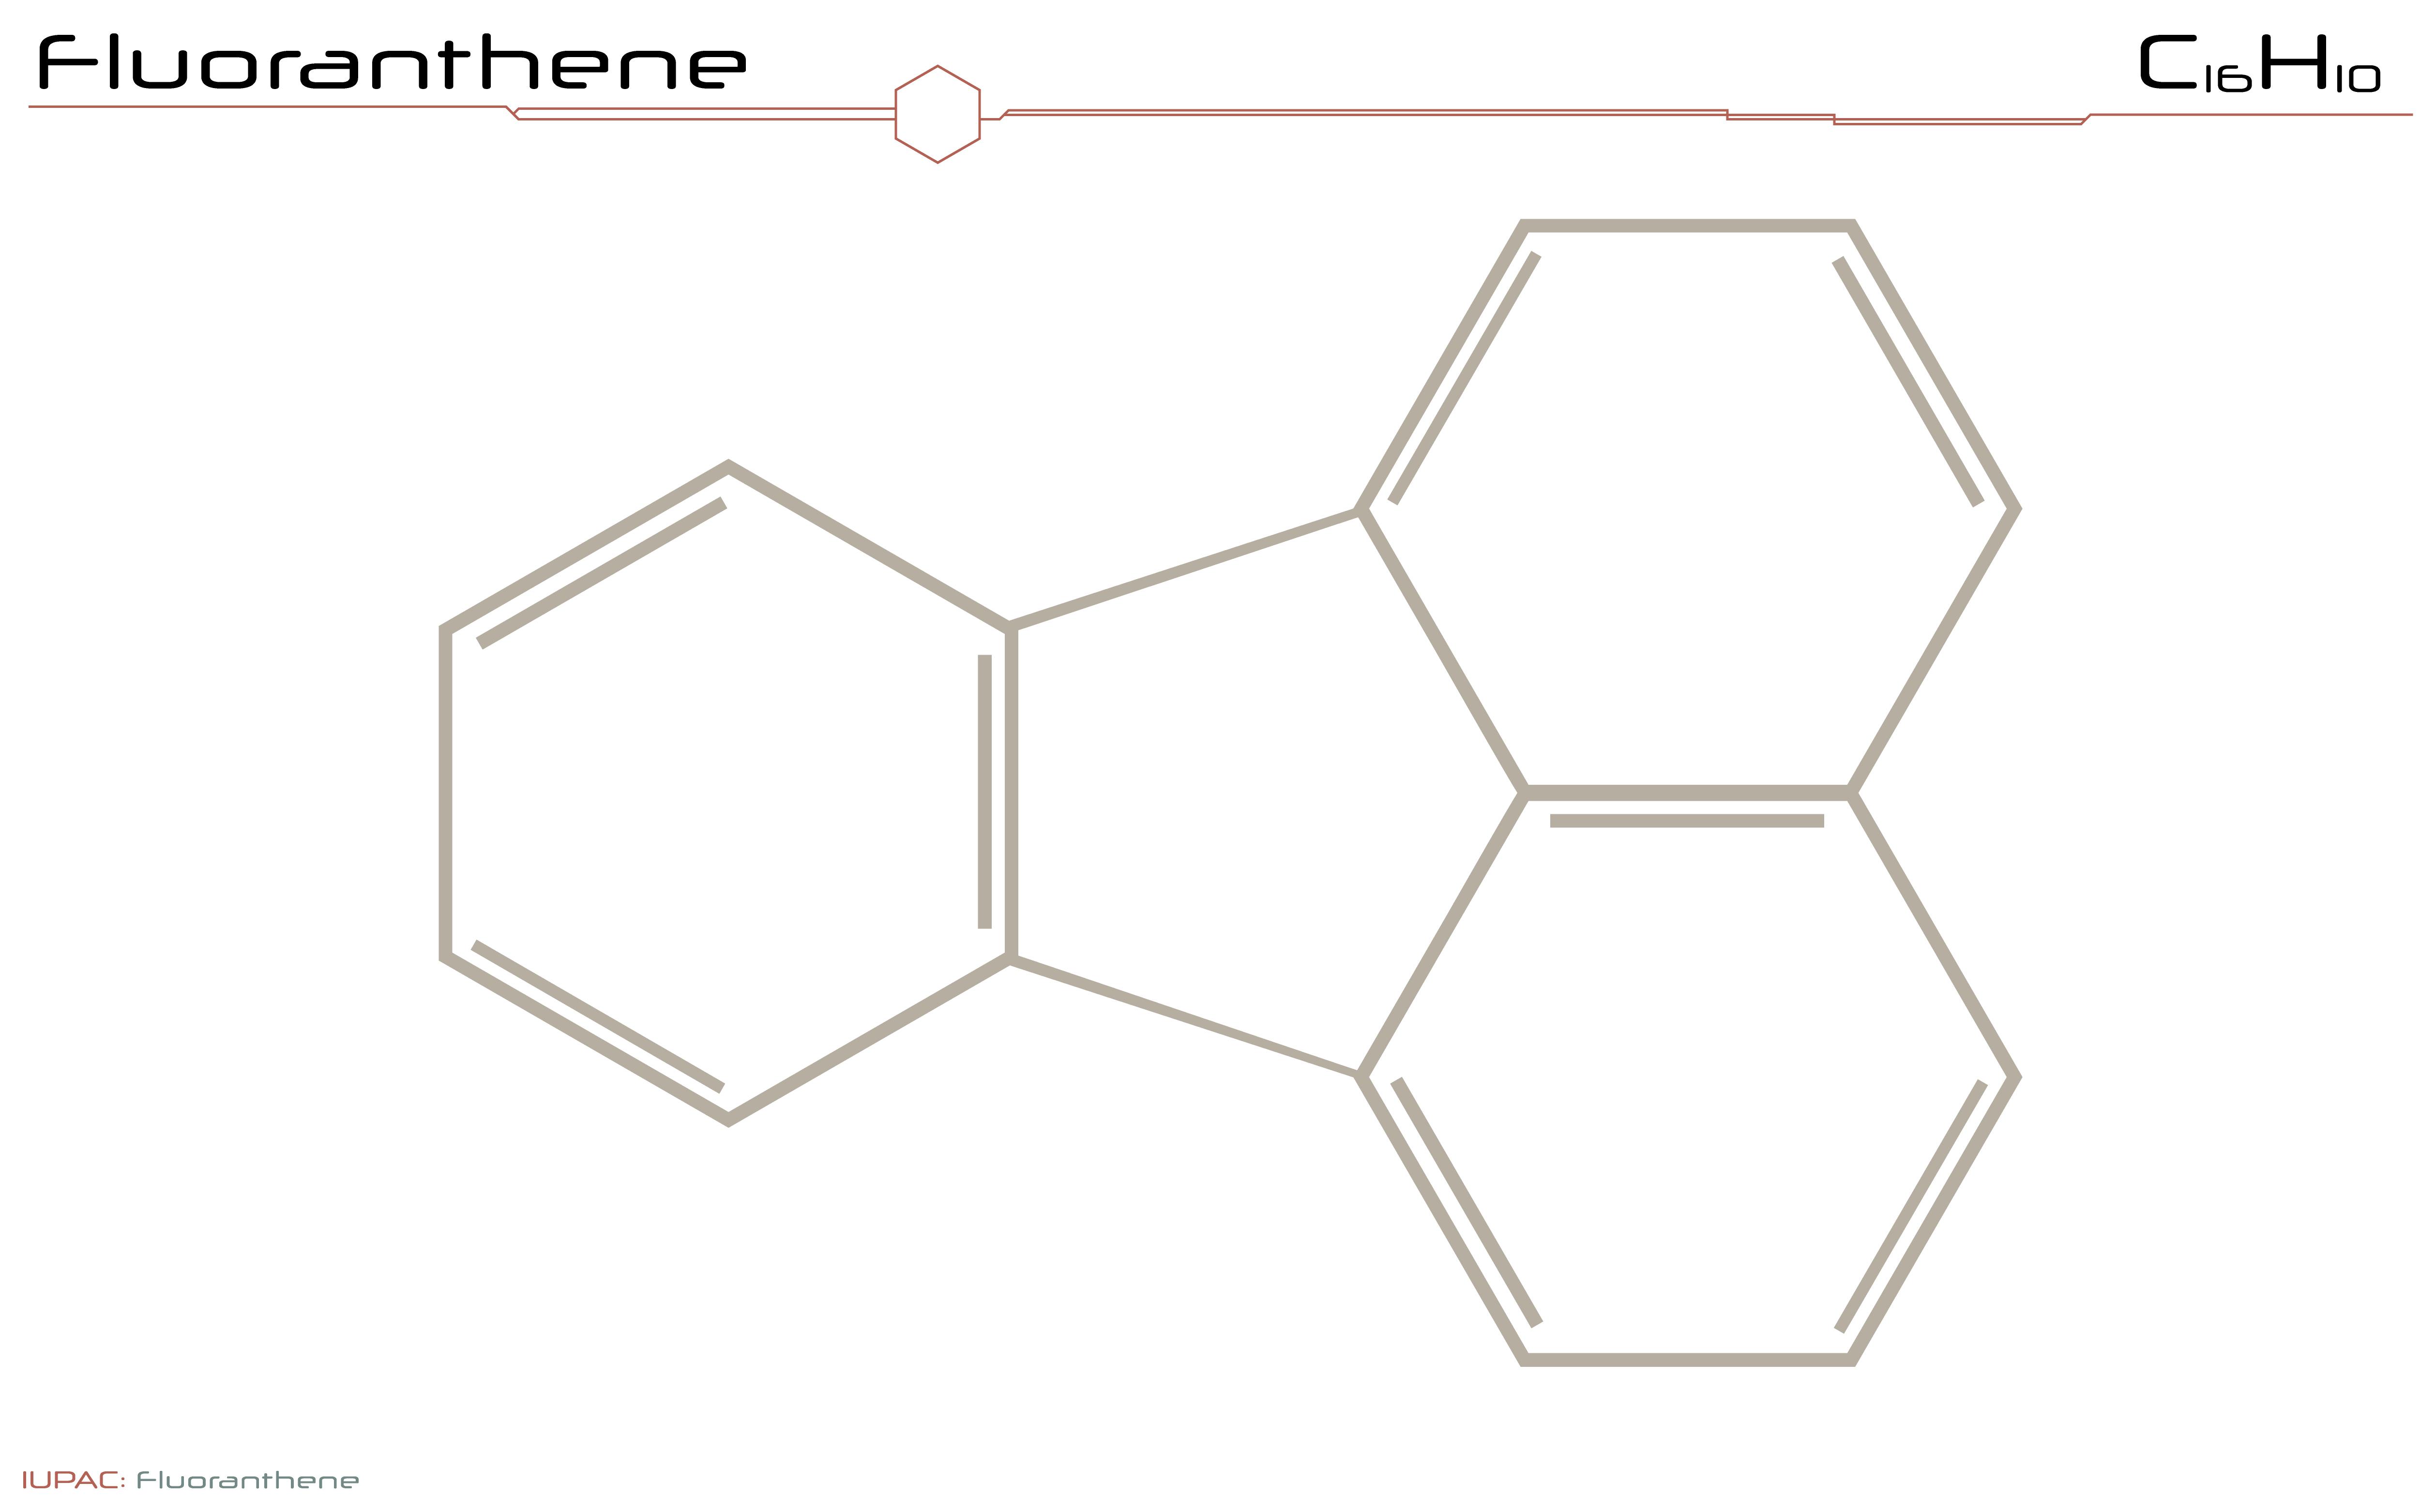 【EU】欧州化学機関ECHA、フルオランテン等6物質をSVHC候補物質リストに追加 1